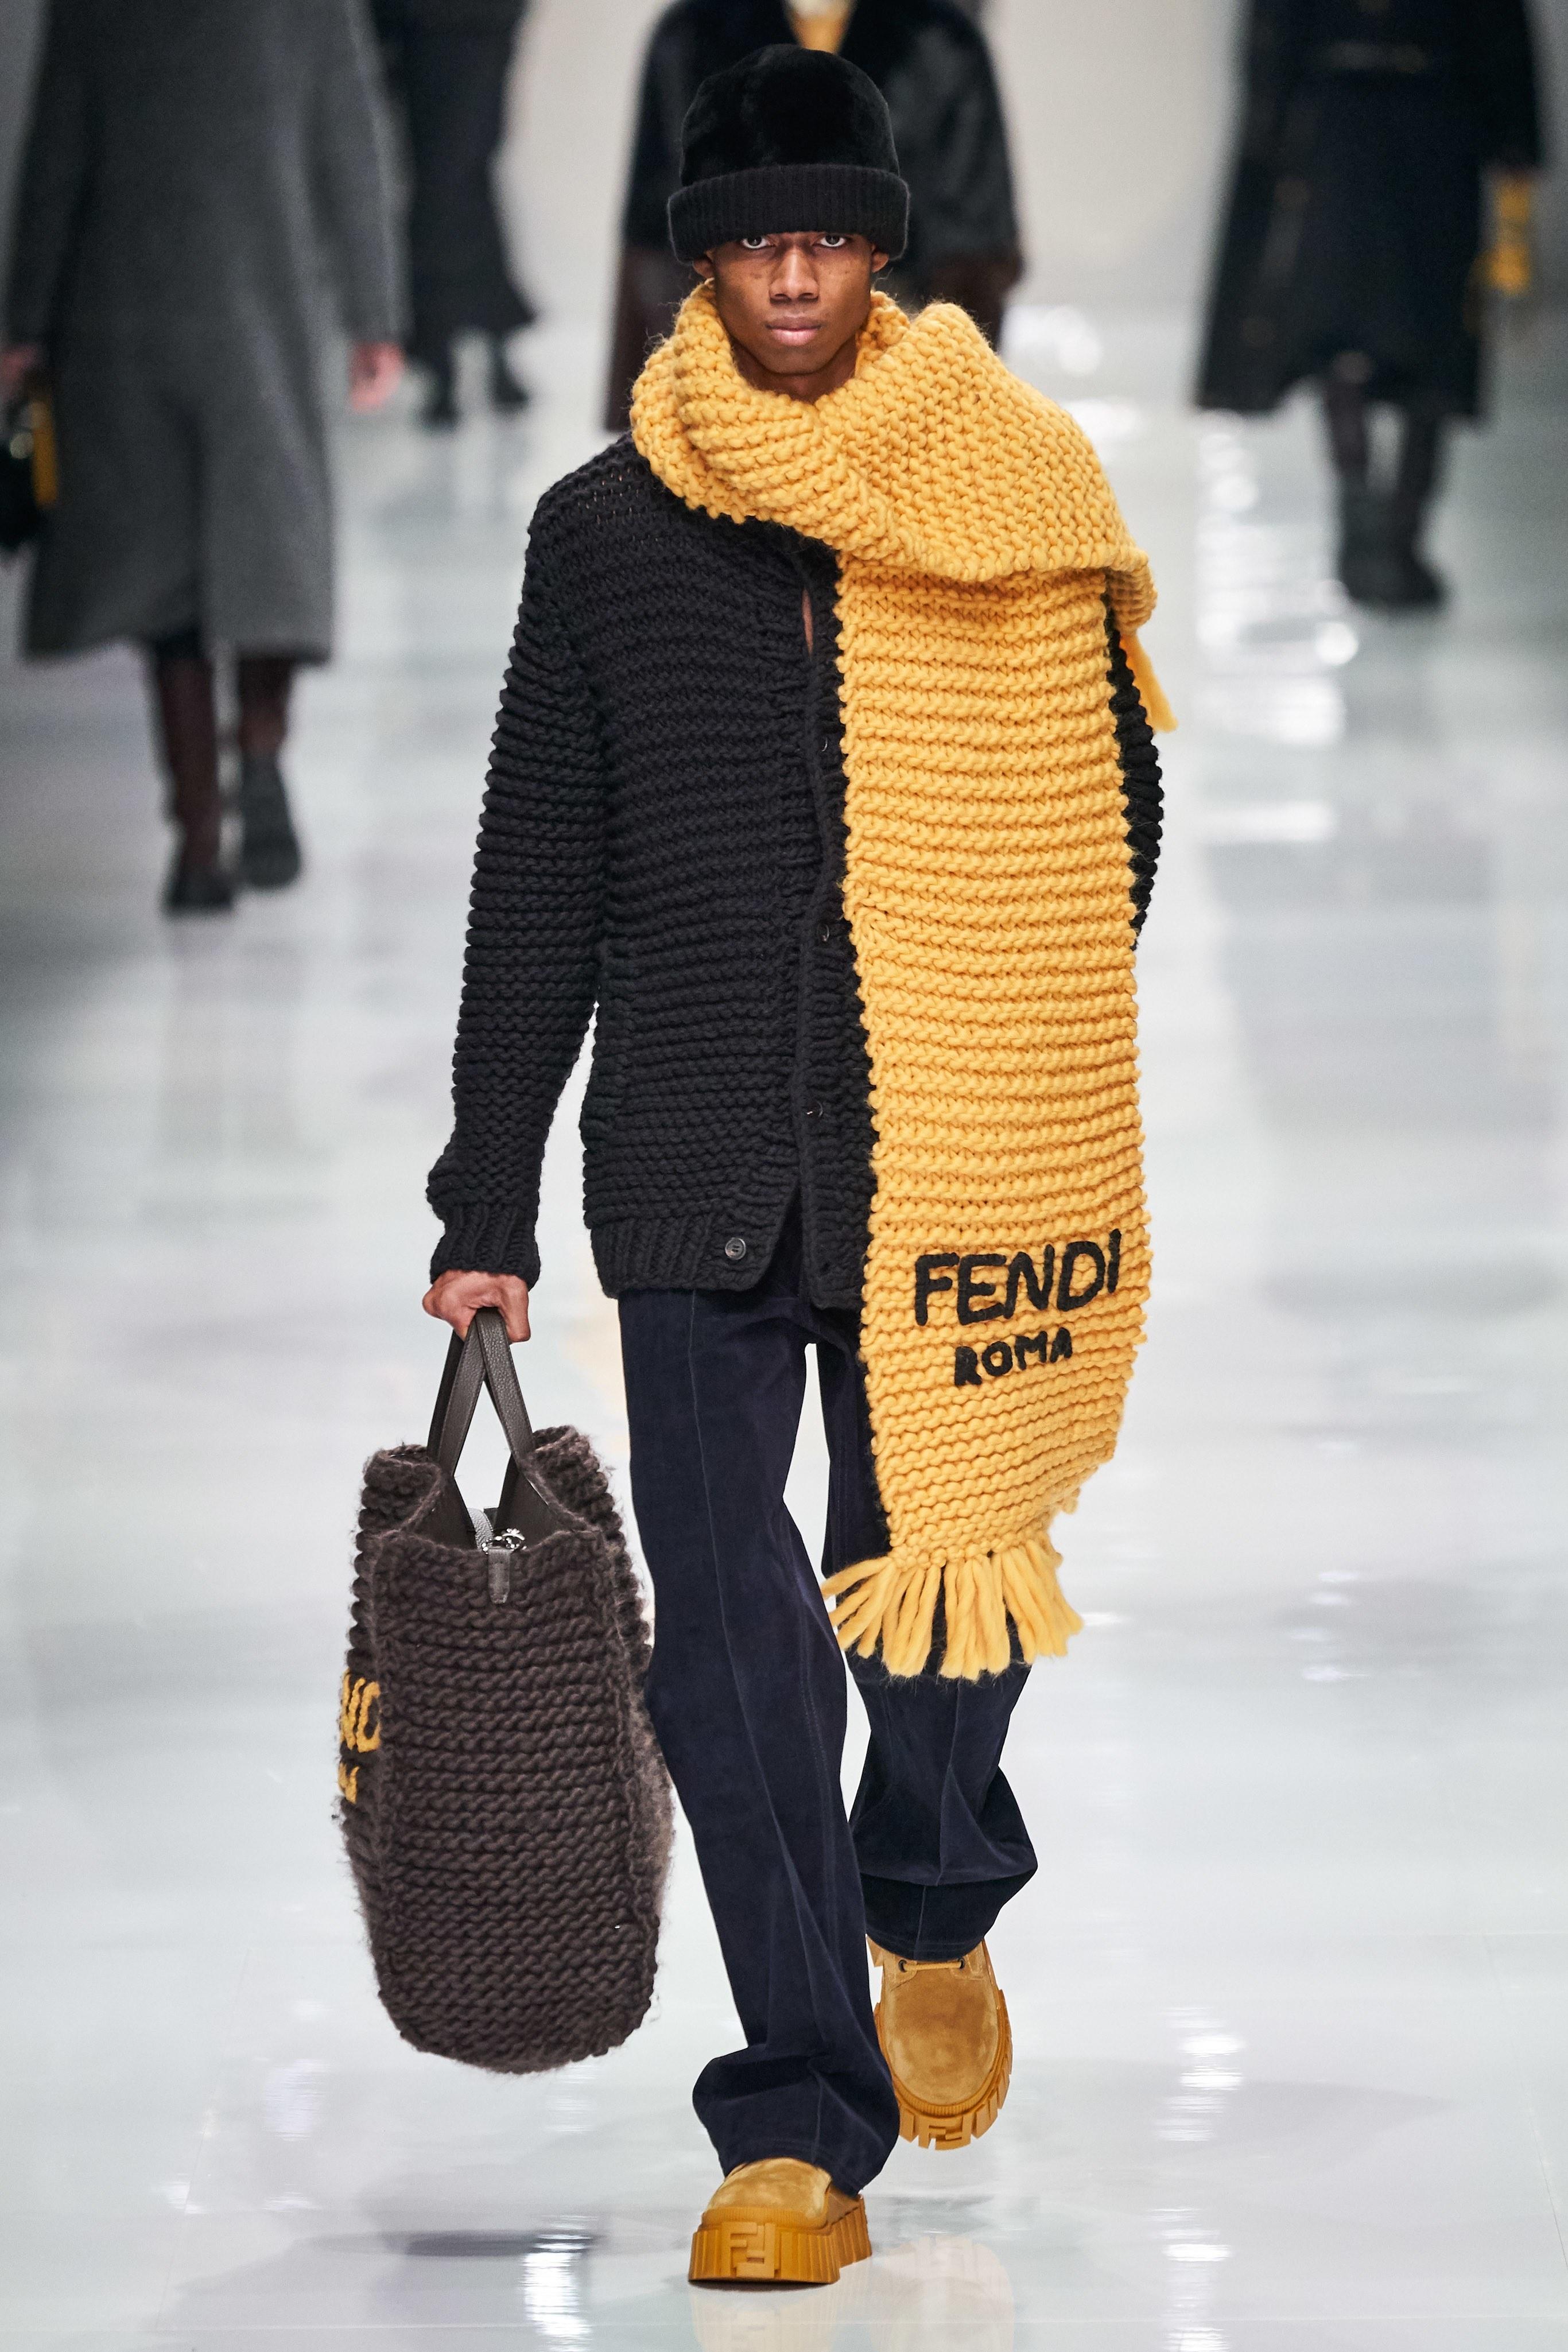 Chieu den tia UV, Fendi thay doi mau sac trang phuc ngay tren san khau hinh anh 13 FD11.jpg